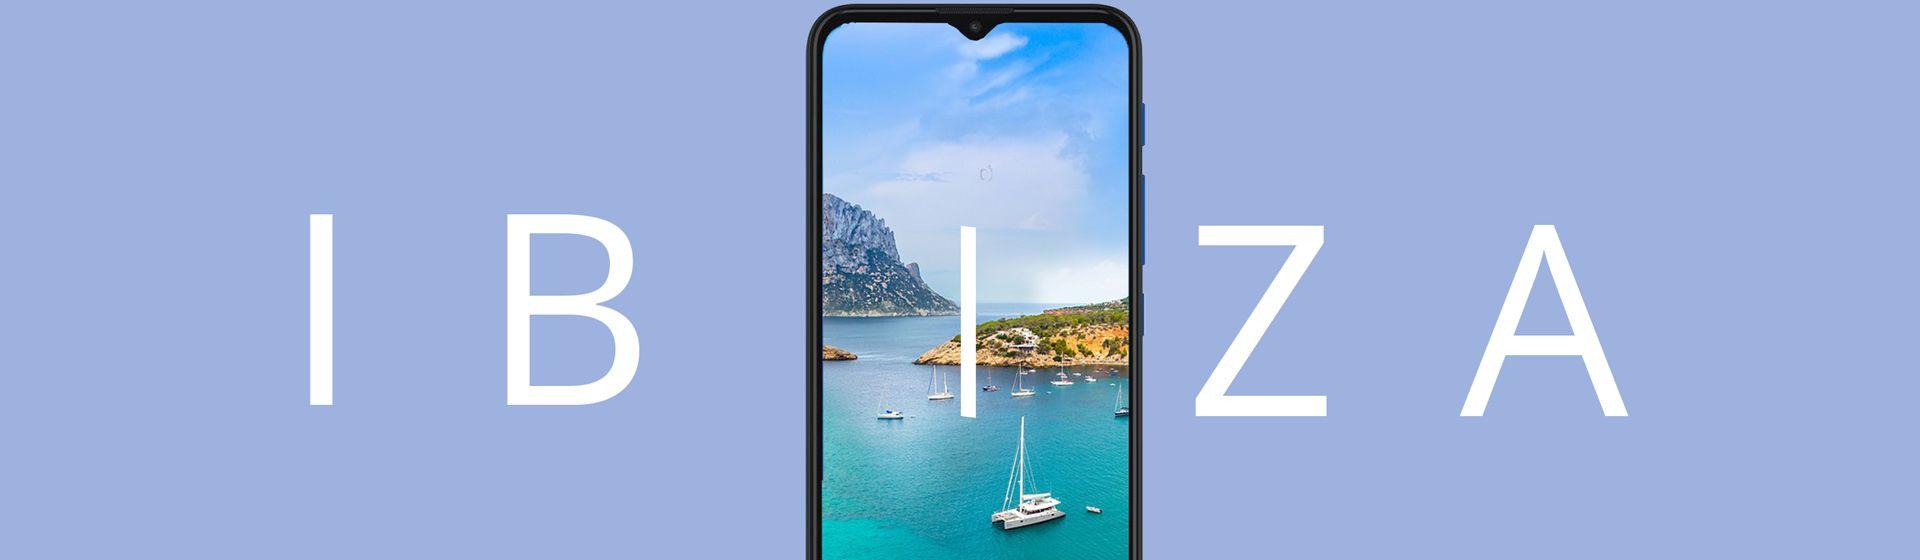 "Motorola Ibiza será o intermediário ""básico"" com 5G da Motorola segundo rumores"